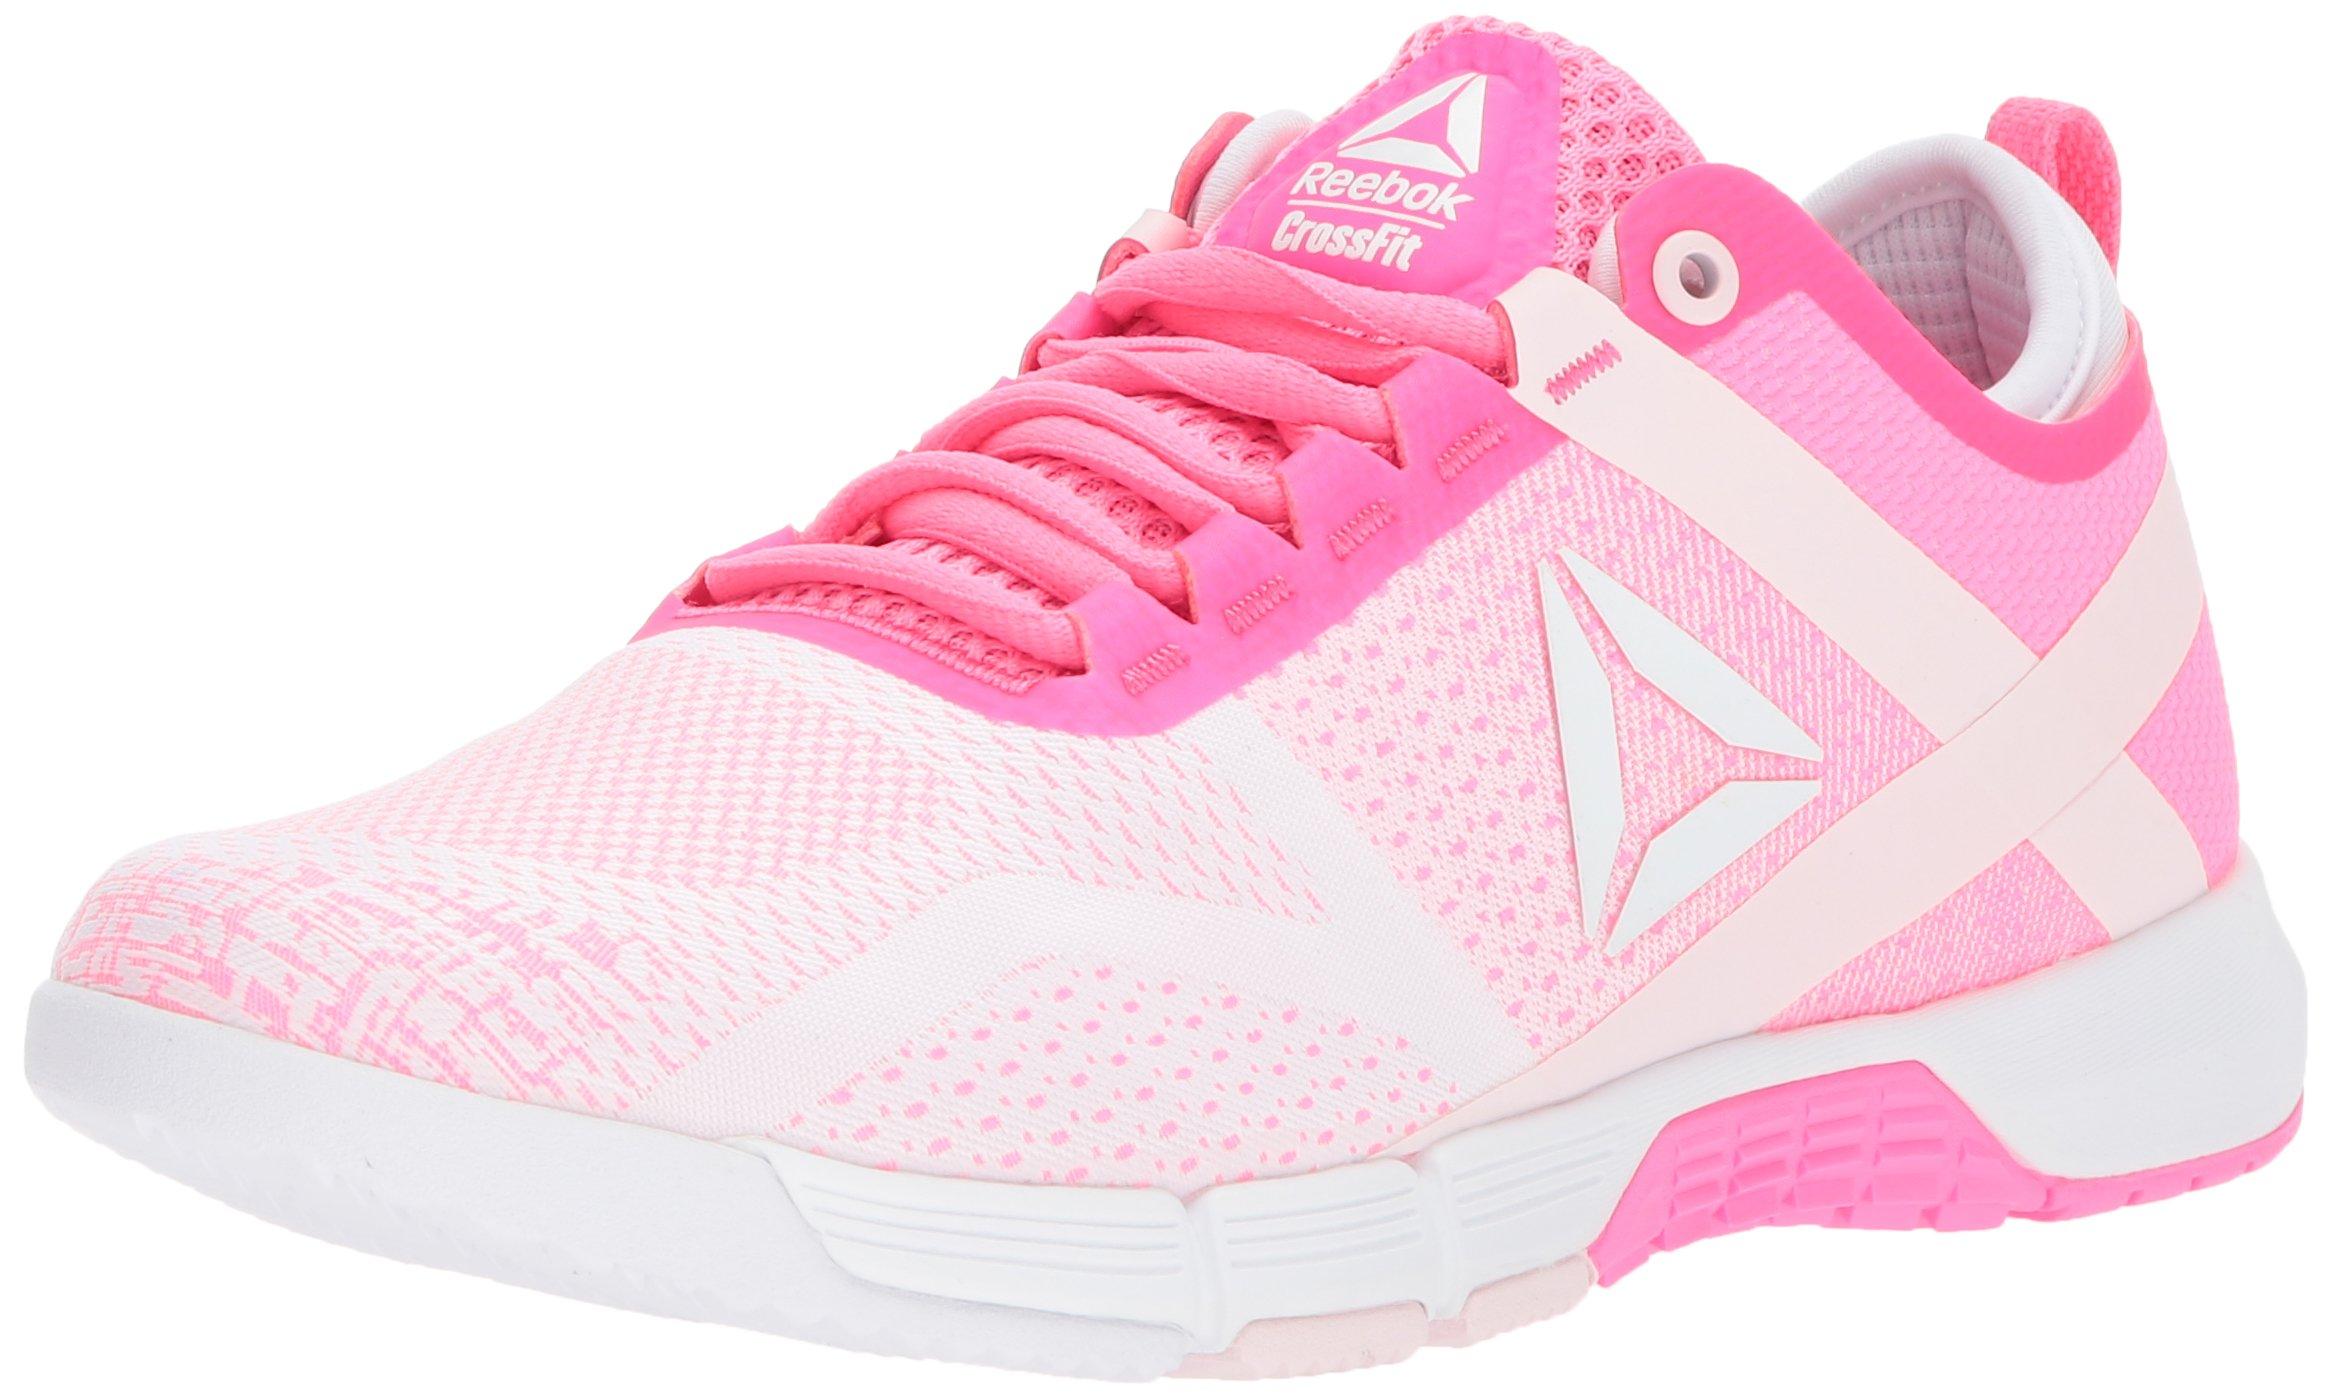 Reebok Women's R Crossfit Grace TR Sneaker, Avon-Poison Pink/White/Po, 7.5 M US